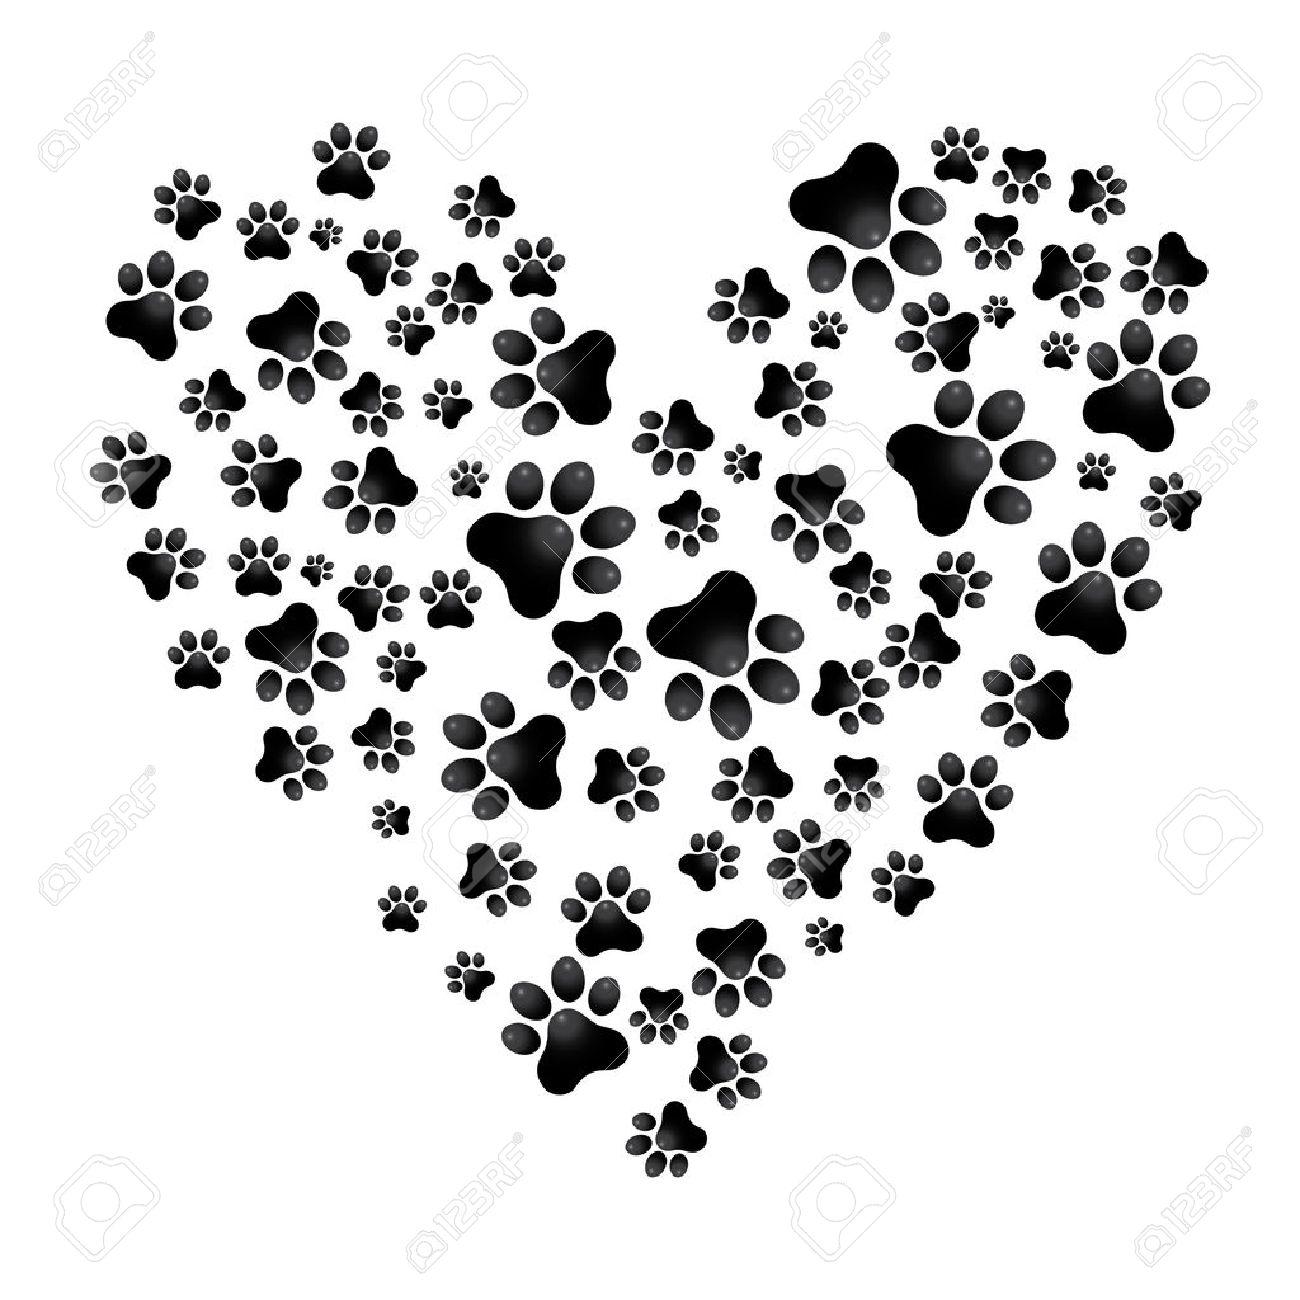 adopt dog paw heart vector animal help illustration royalty free